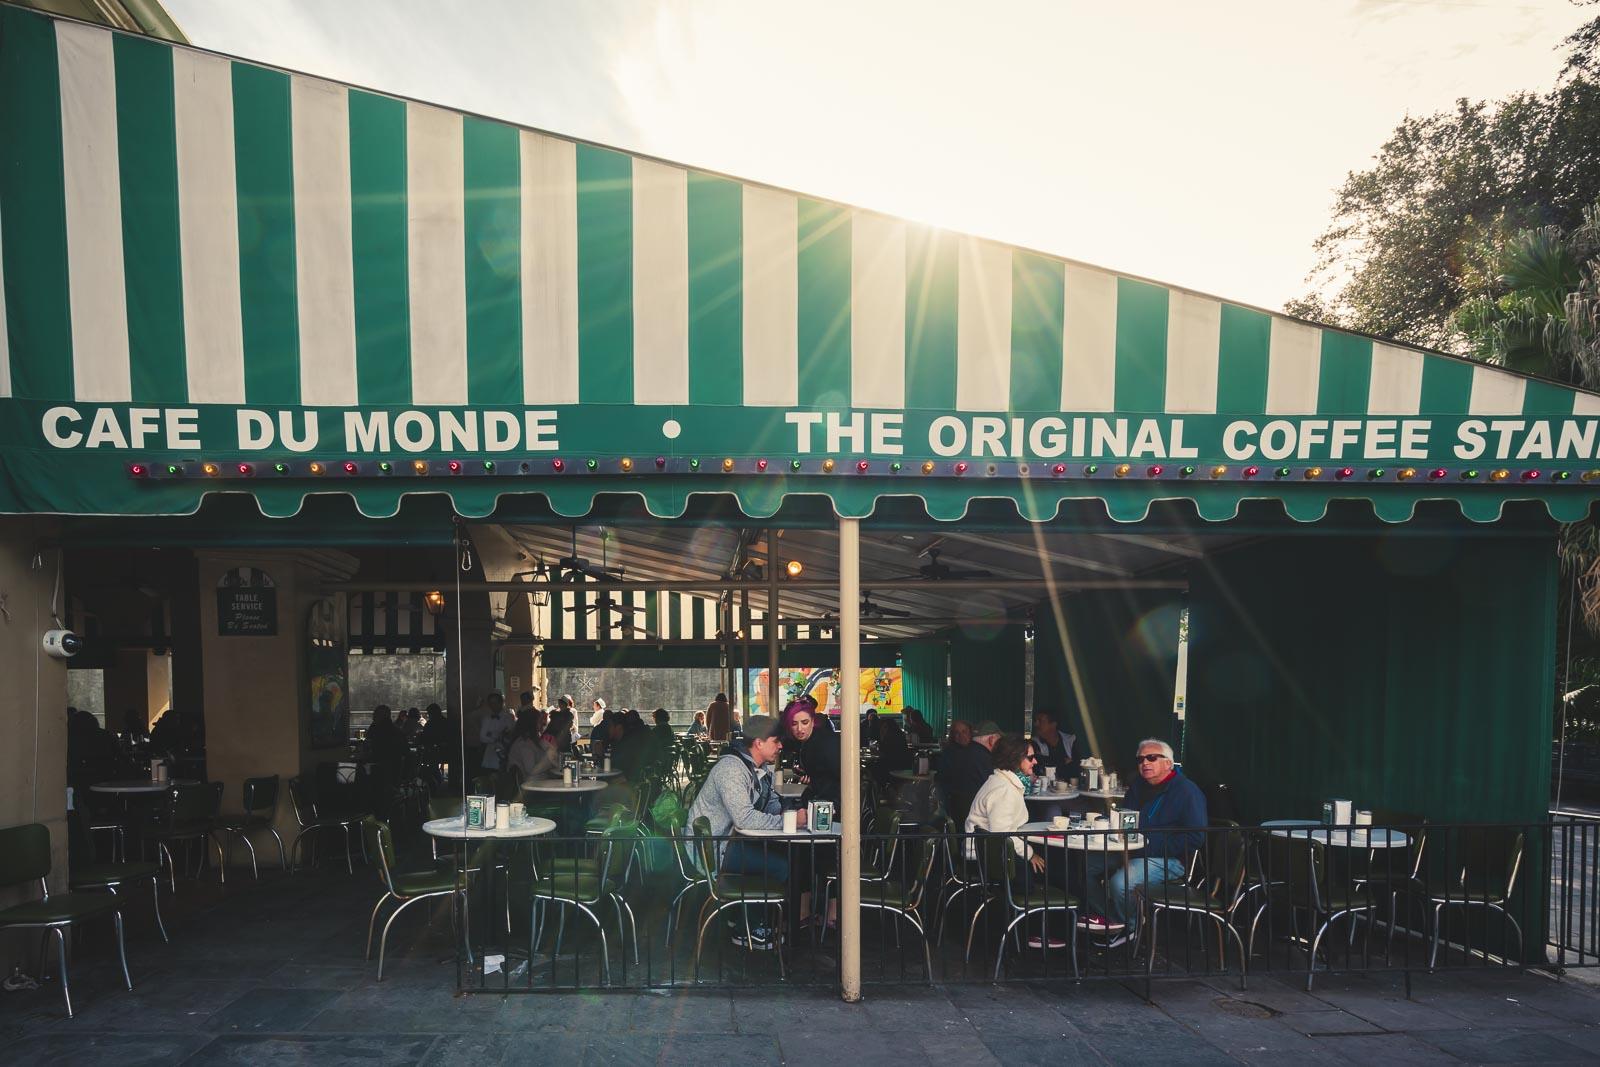 cafe du monde - 3 days in new orleans breakfast